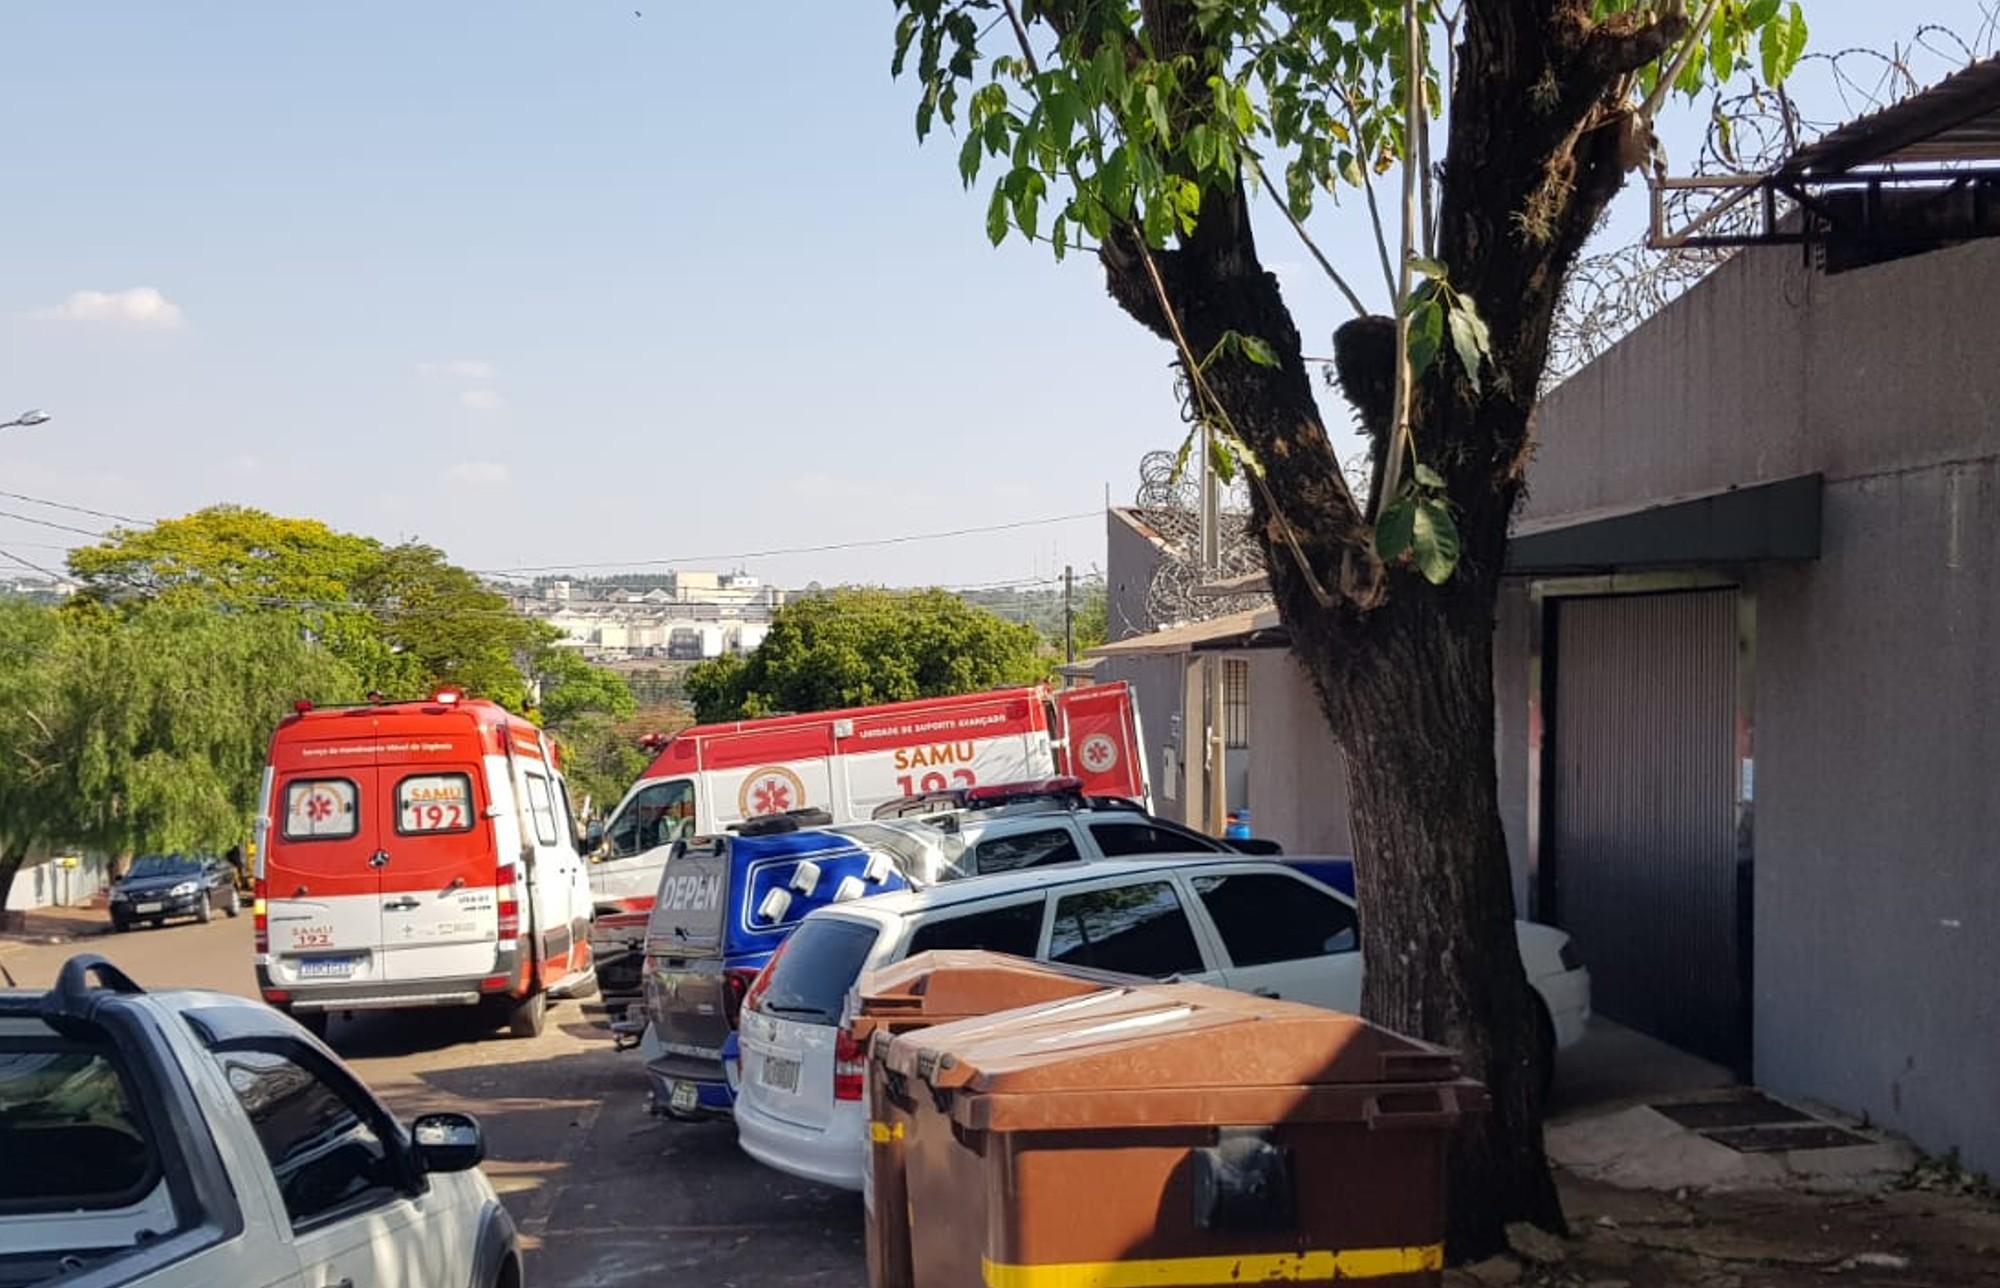 Dois presos morrem em briga generalizada na Cadeia Pública de Toledo, diz Depen